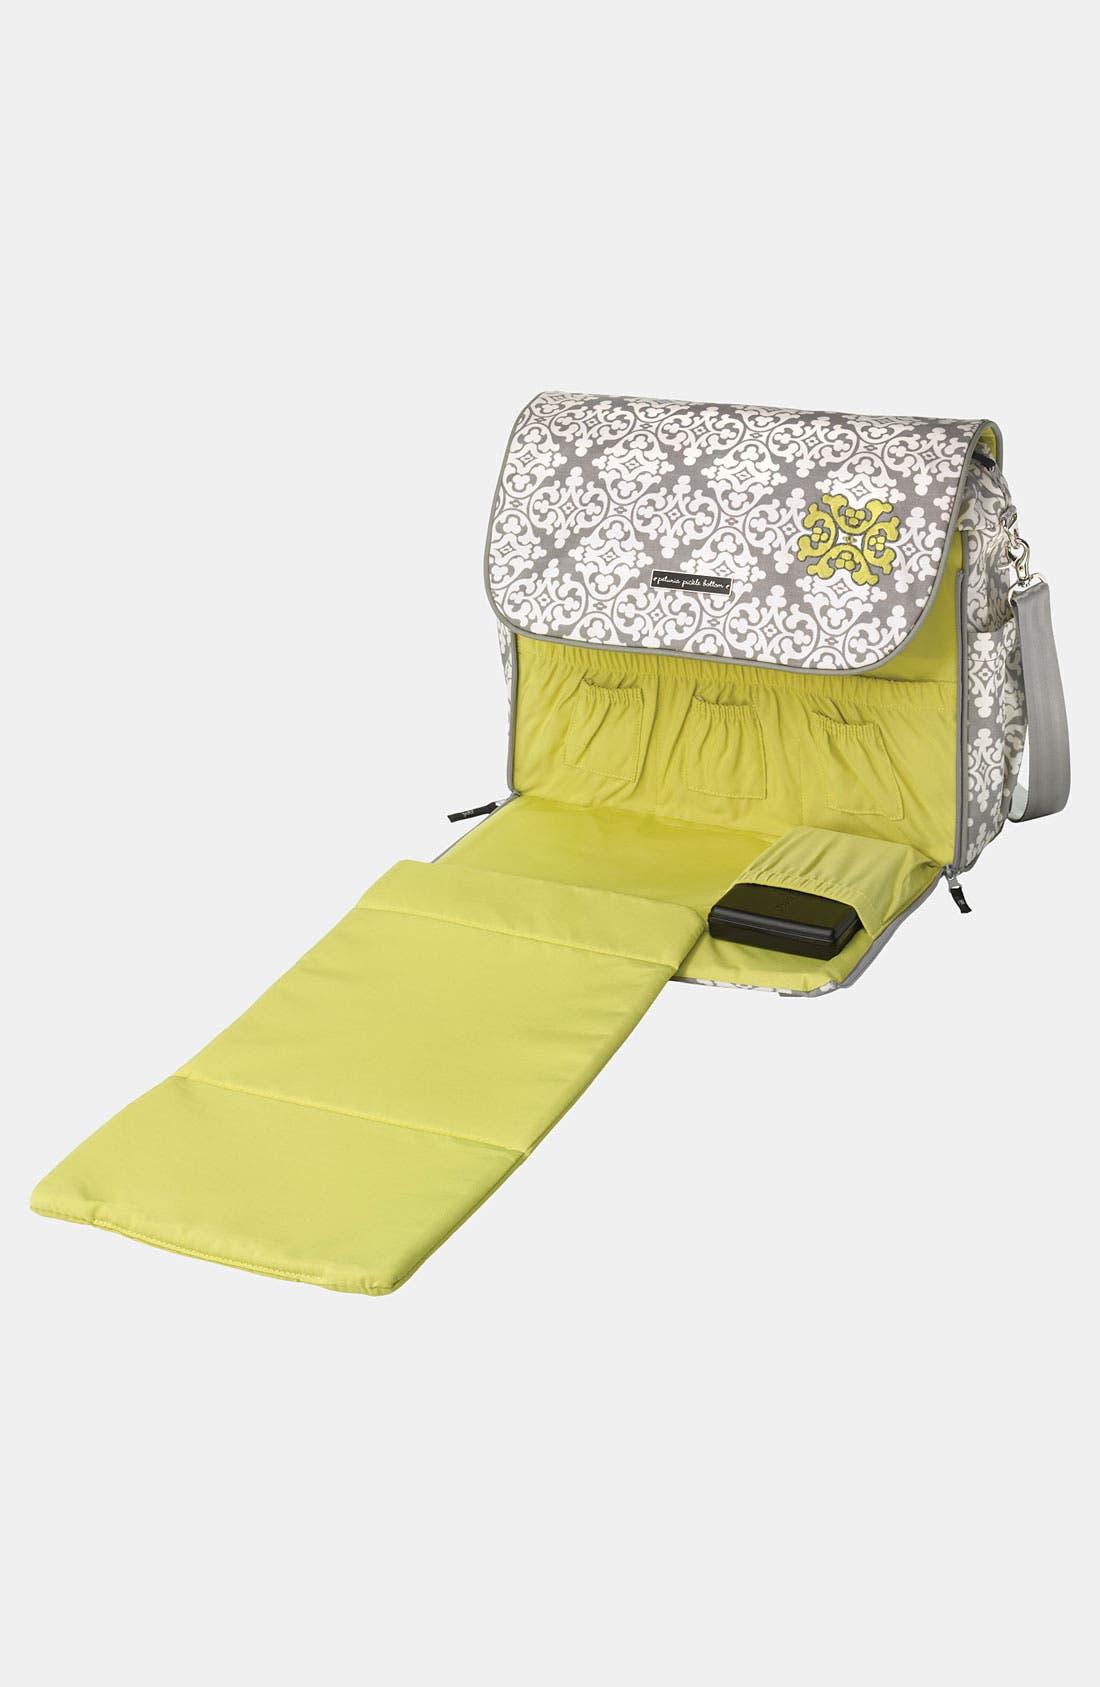 Alternate Image 3  - Petunia Pickle Bottom 'Abundance Boxy' Glazed Backpack Diaper Bag